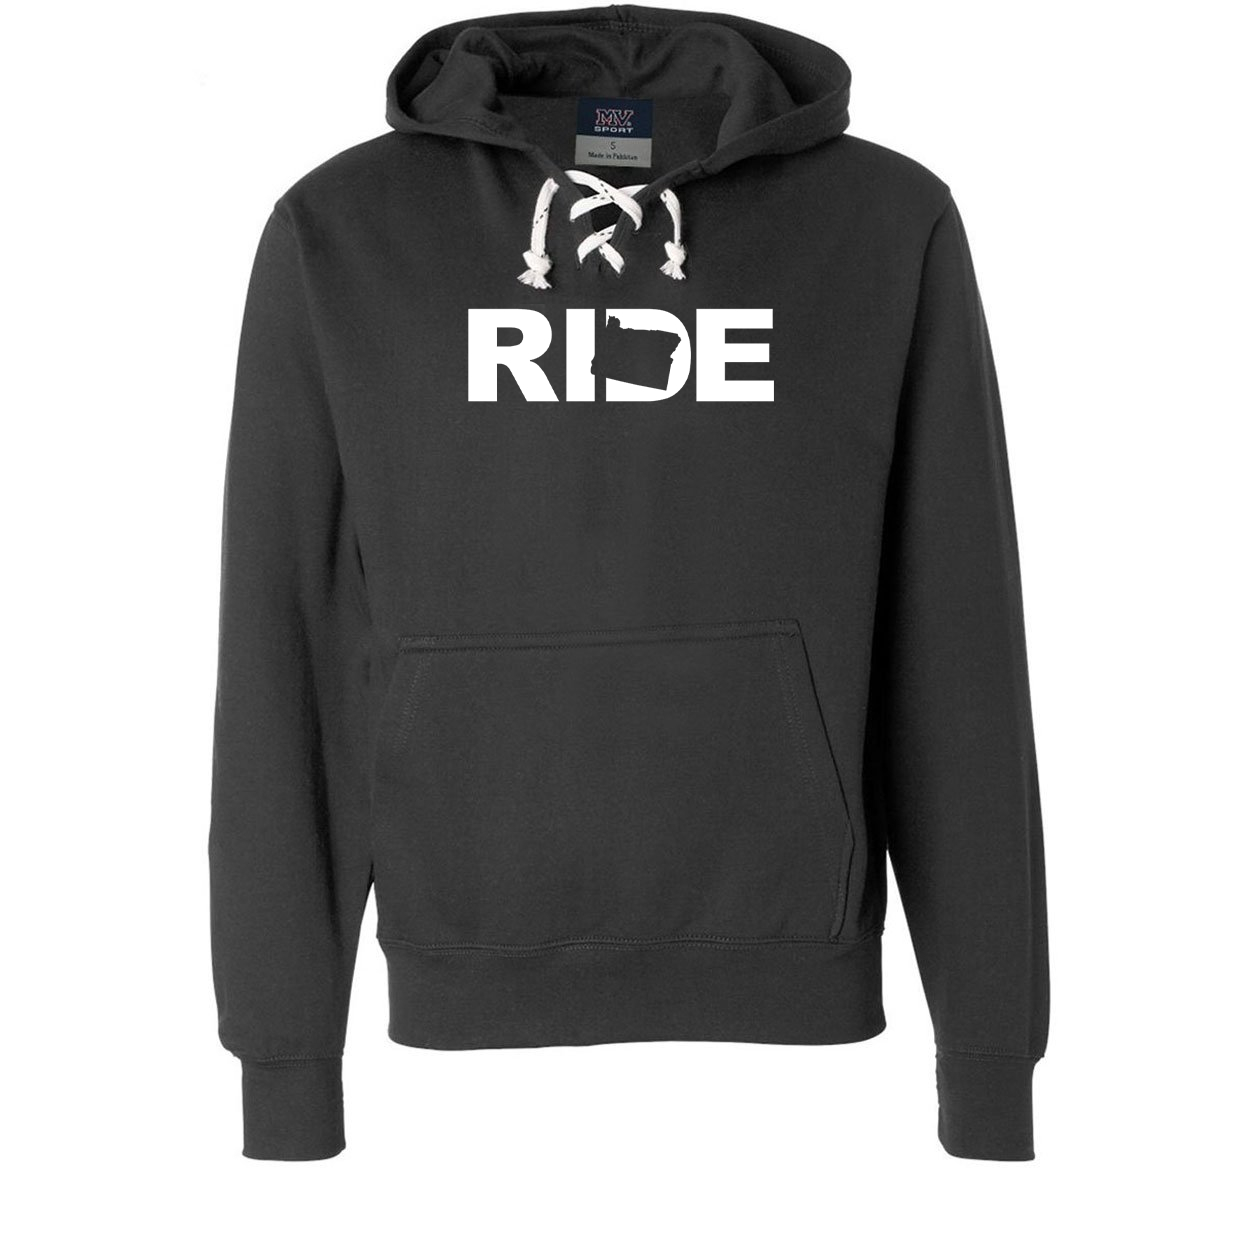 Ride Oregon Classic Unisex Premium Hockey Sweatshirt Black (White Logo)